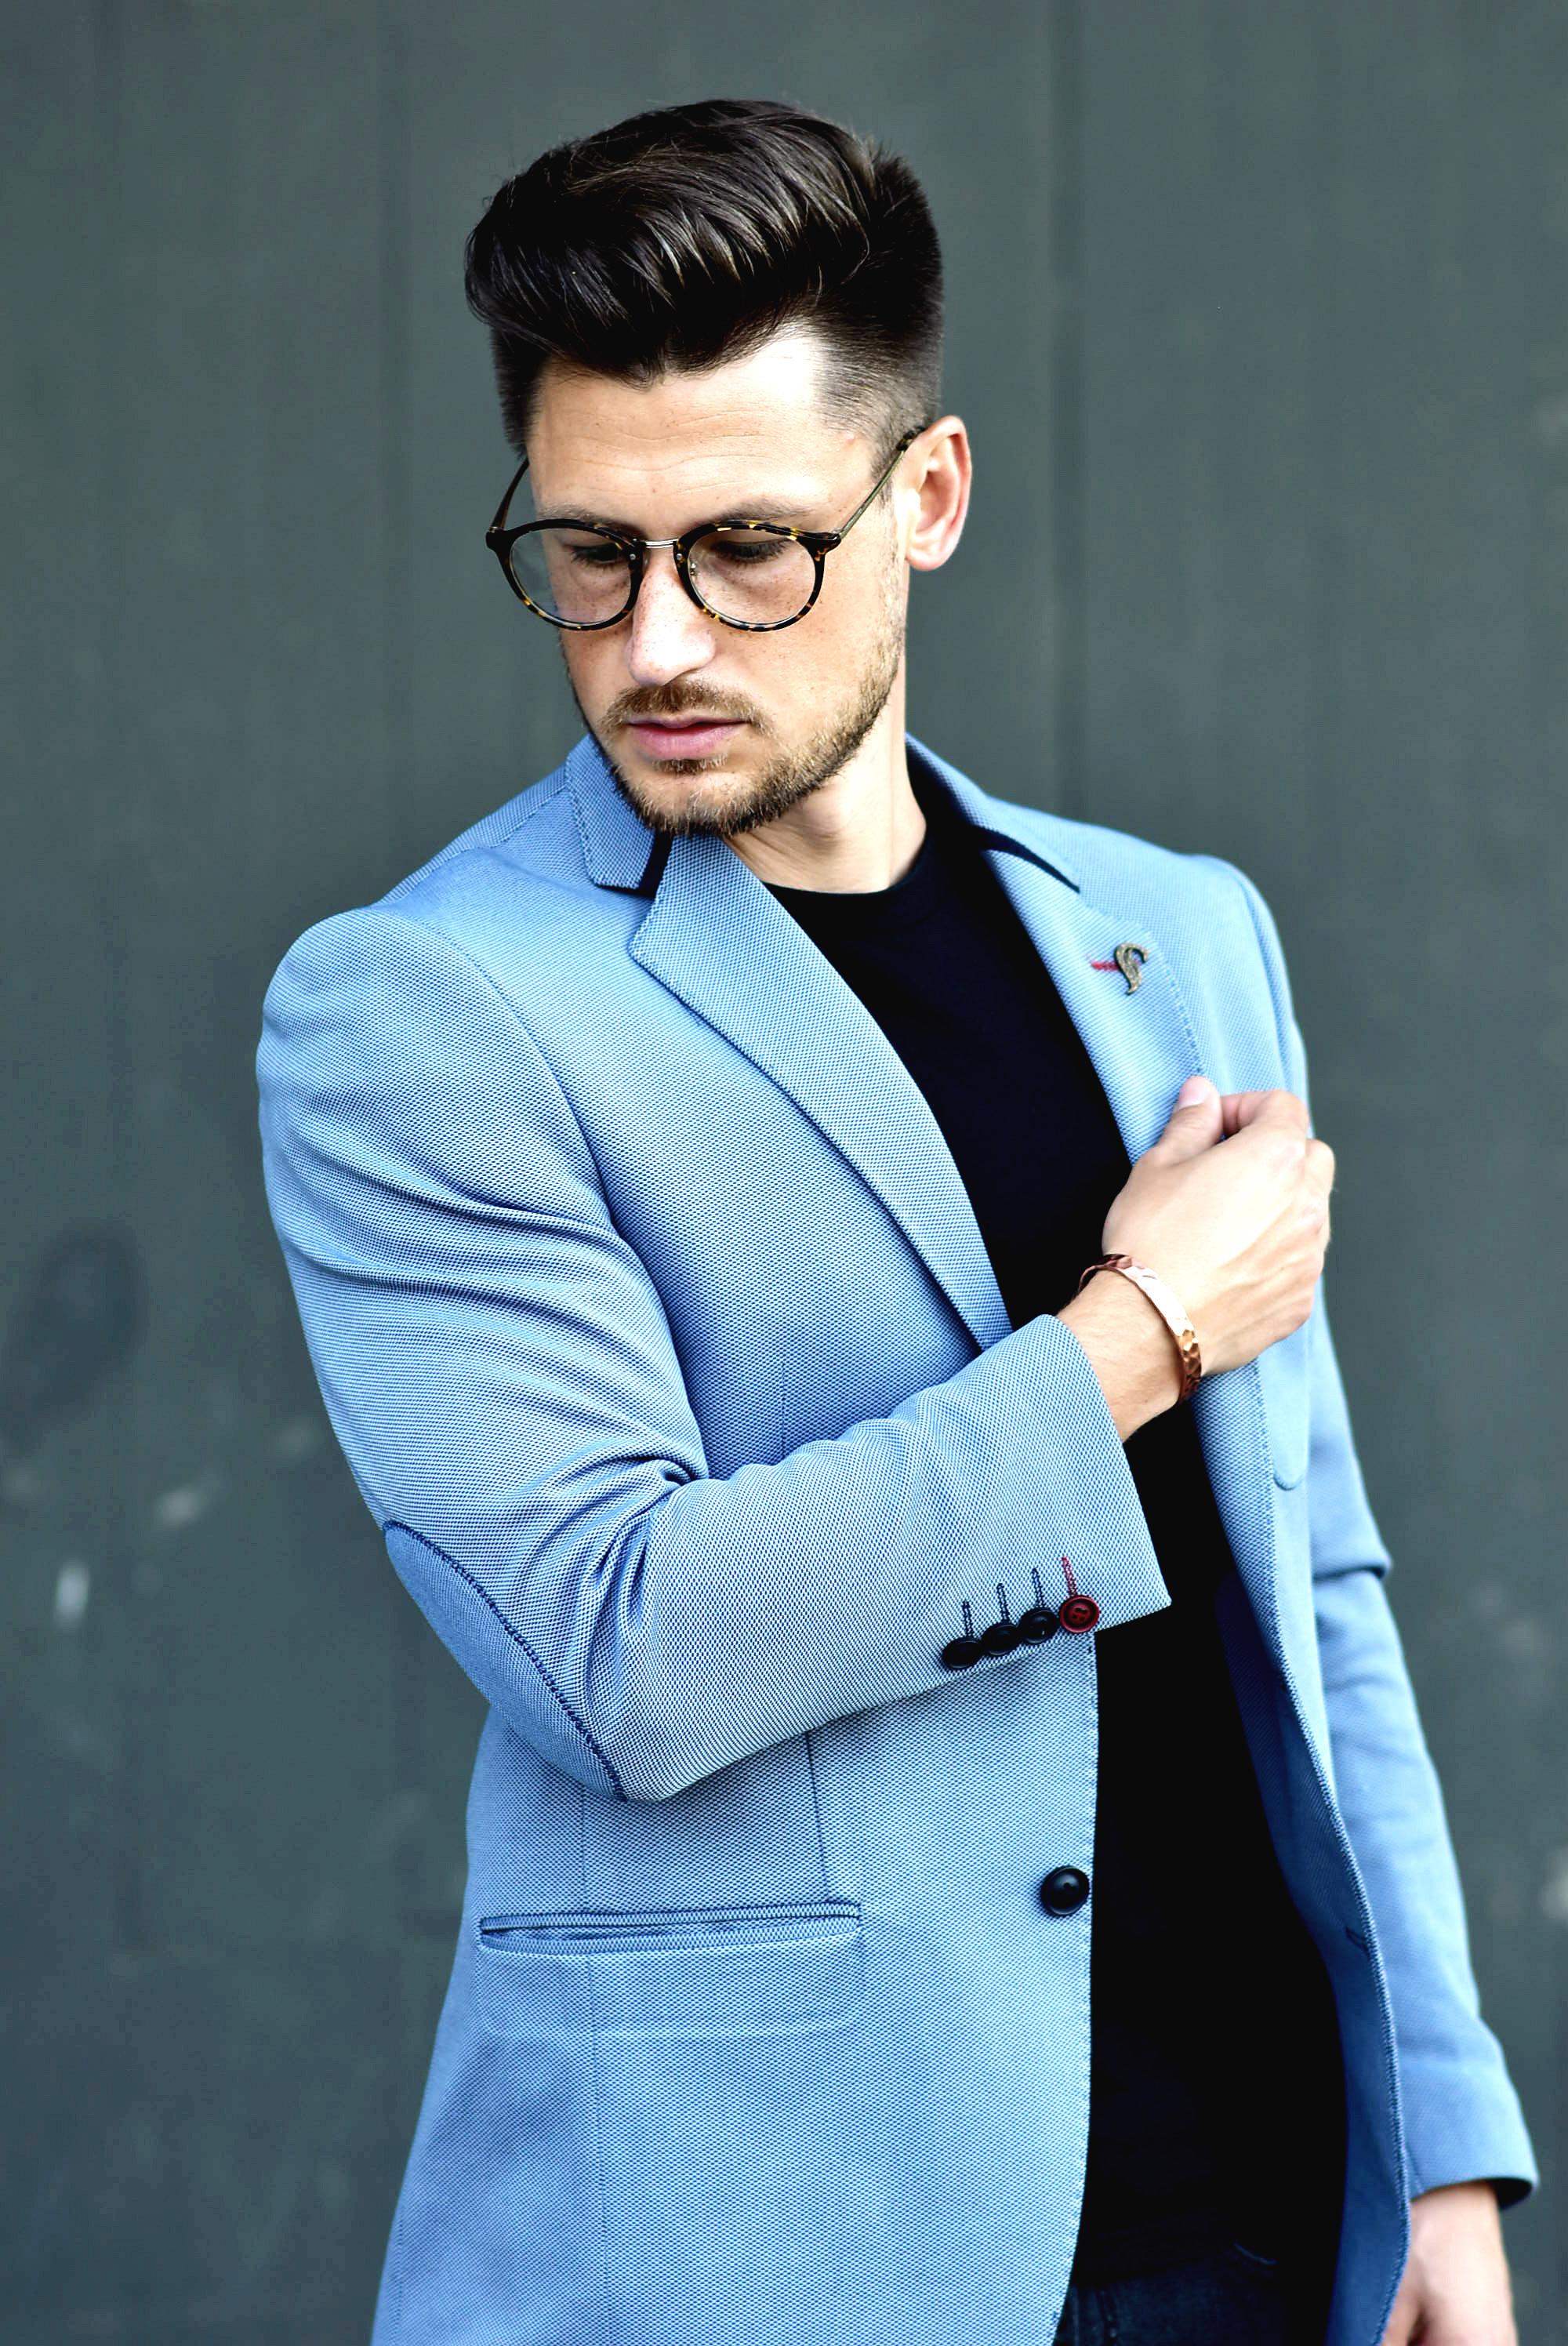 Tommeezjerry-Styleblog-Männerblog-Männer-Modeblog-Berlin-Berlinblog-Outfit-Streetlook-Royalblauer-Blazer-Royalblue-All-Black-Look-Chelsea-Boots-Skinny-Jeans-11